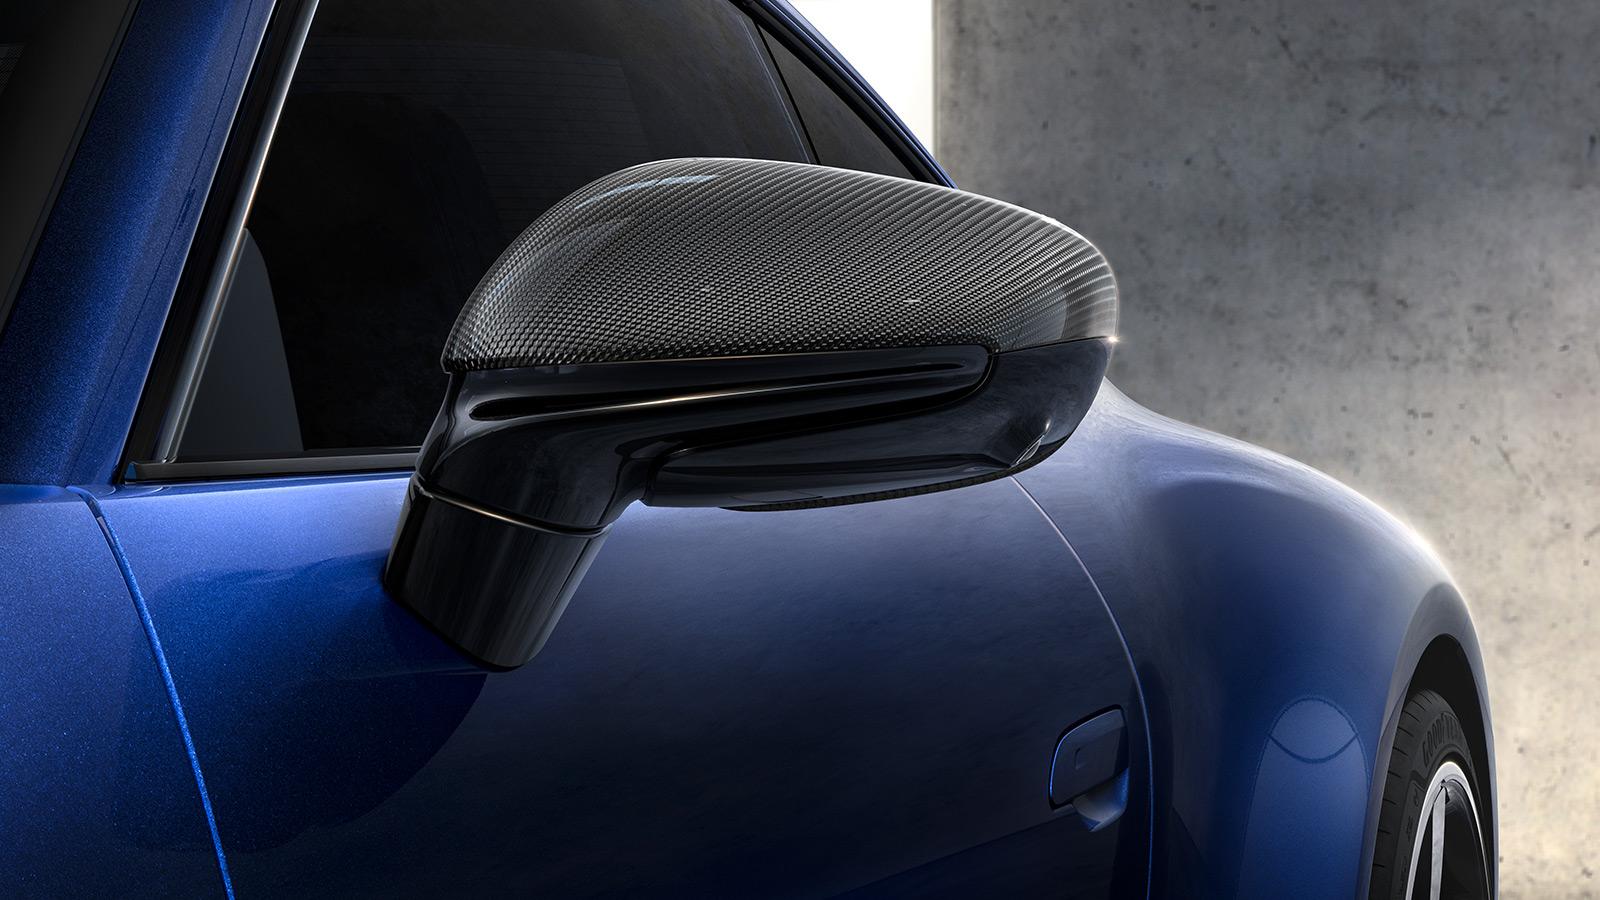 Porsche - Внешний вид и техника: другие опции